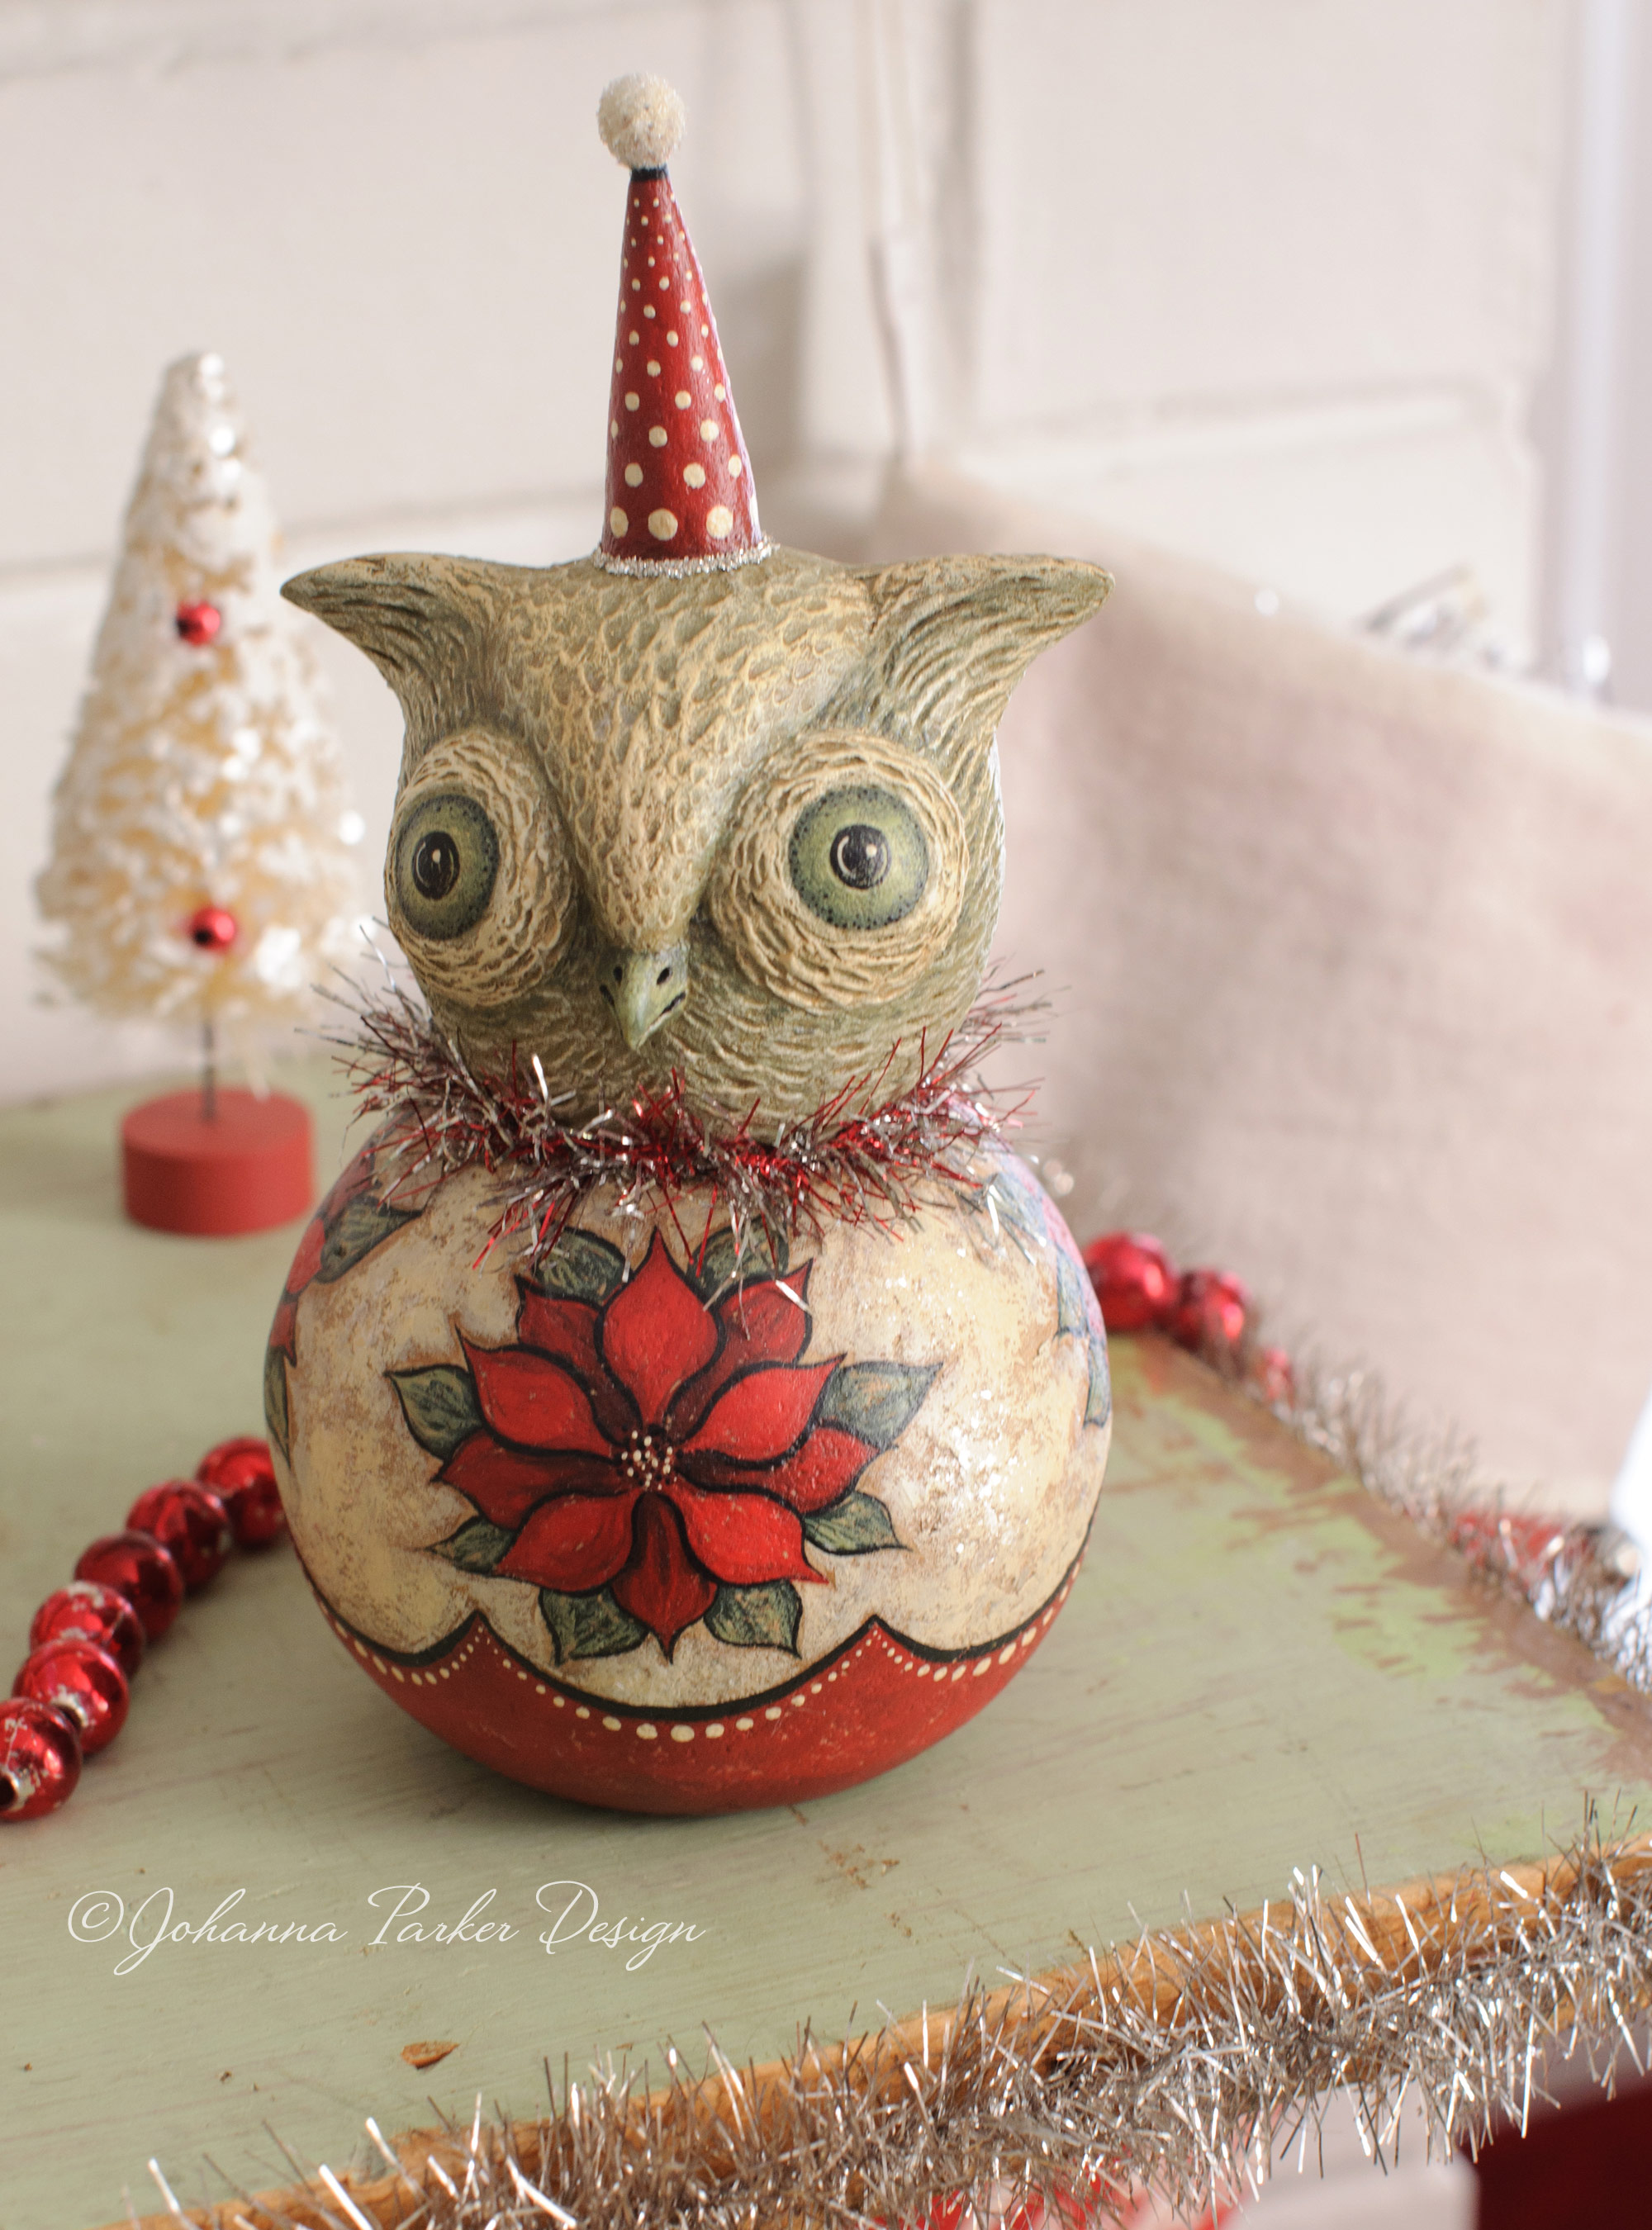 Poinsettia winter owl